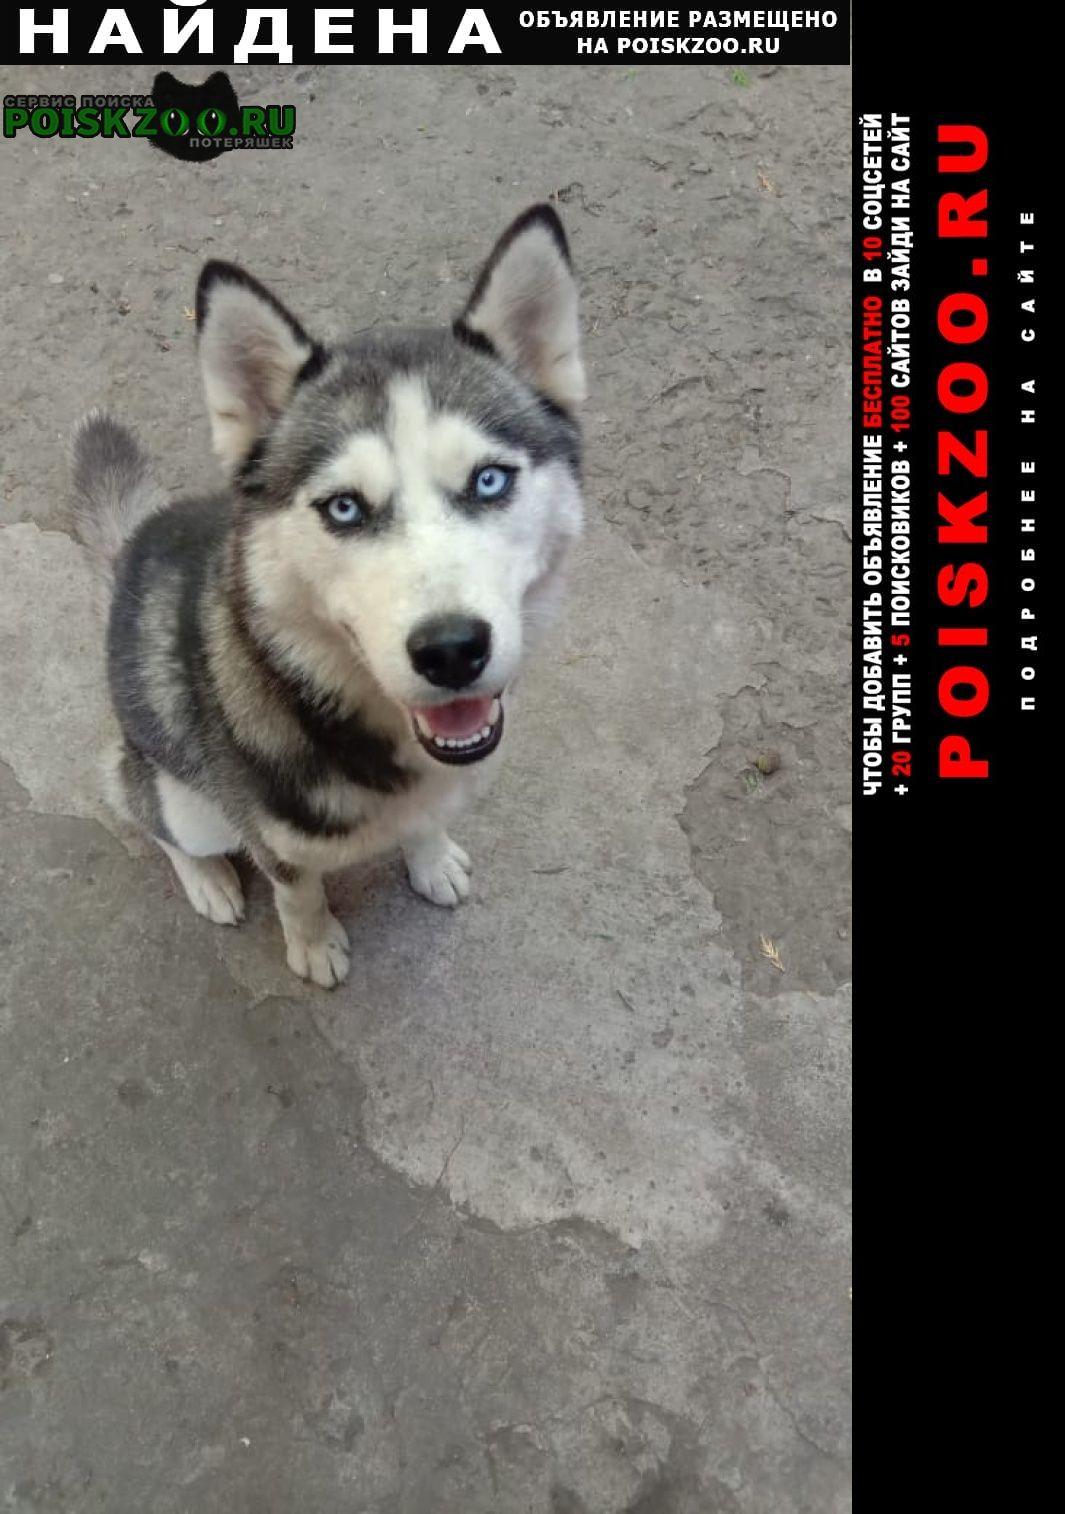 Найдена собака хаски в районе площади чкалова Ростов-на-Дону